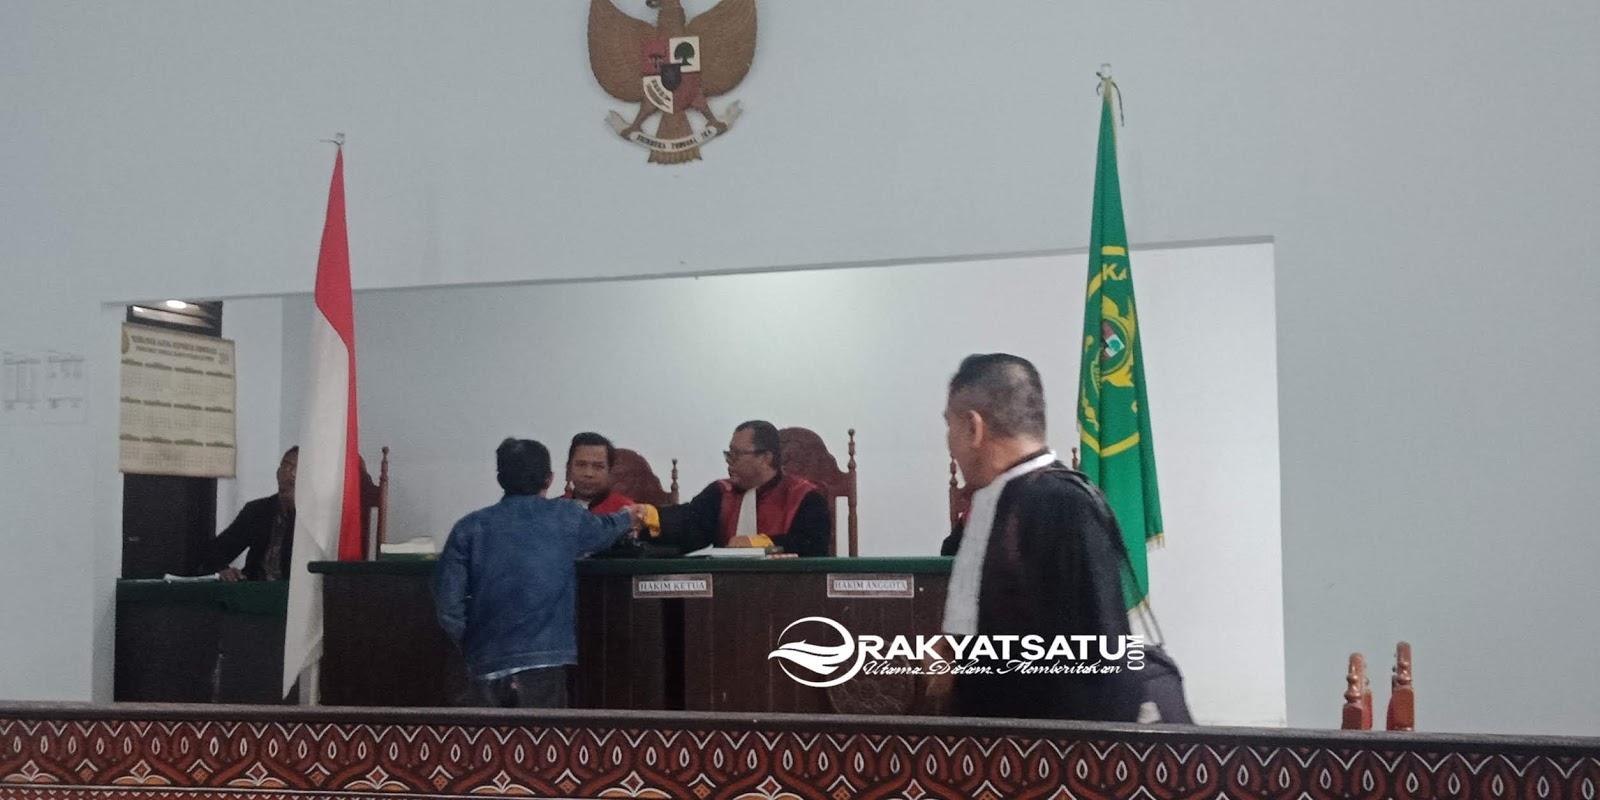 Hanya Didampingi Anaknya, Ketua KPPS PSU Rantebua Terima Vonis Hukuman dari Hakim